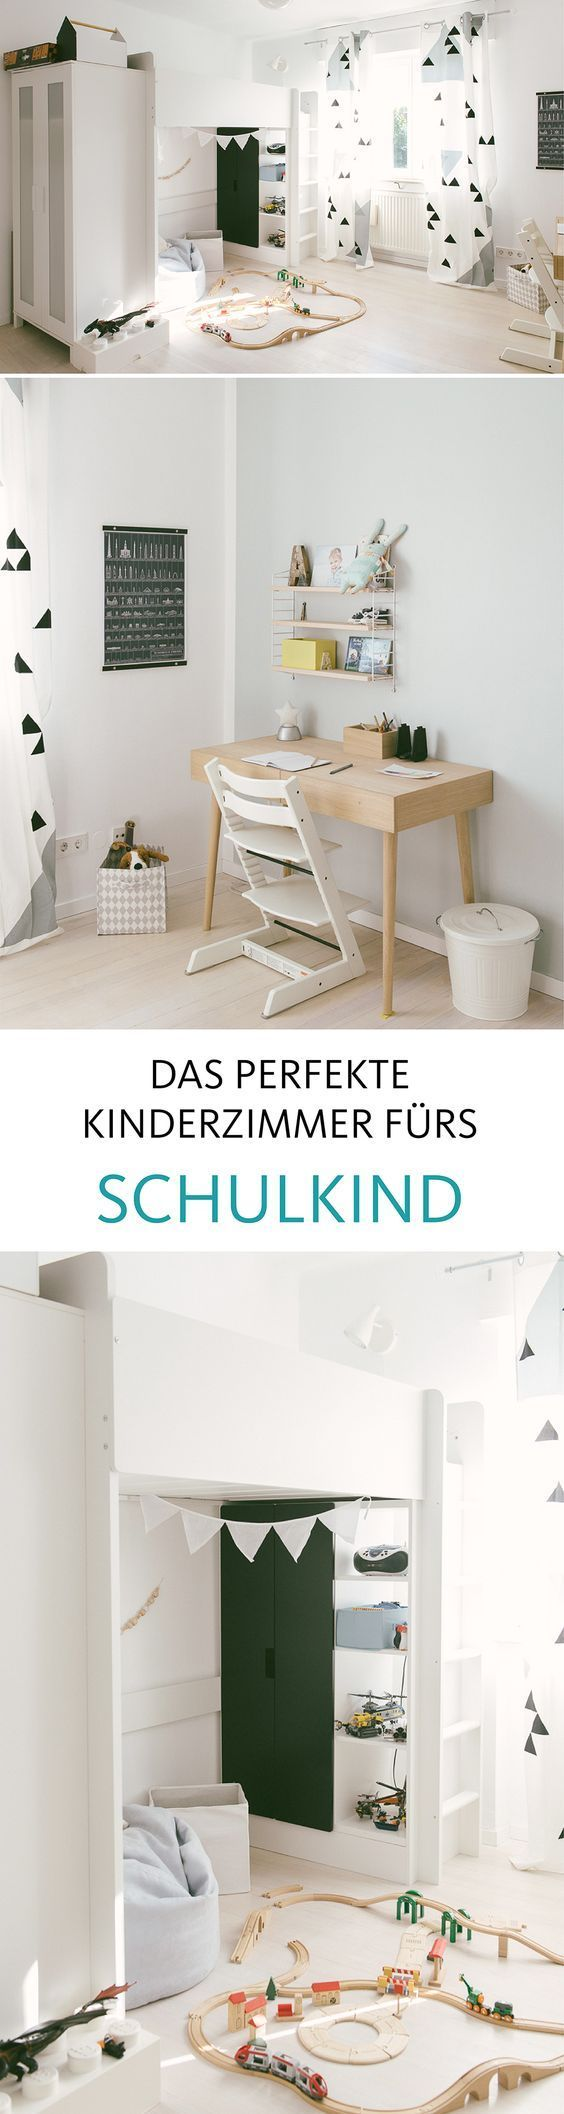 867 best Babyzimmer/Kinderzimmer images on Pinterest   Child room ...